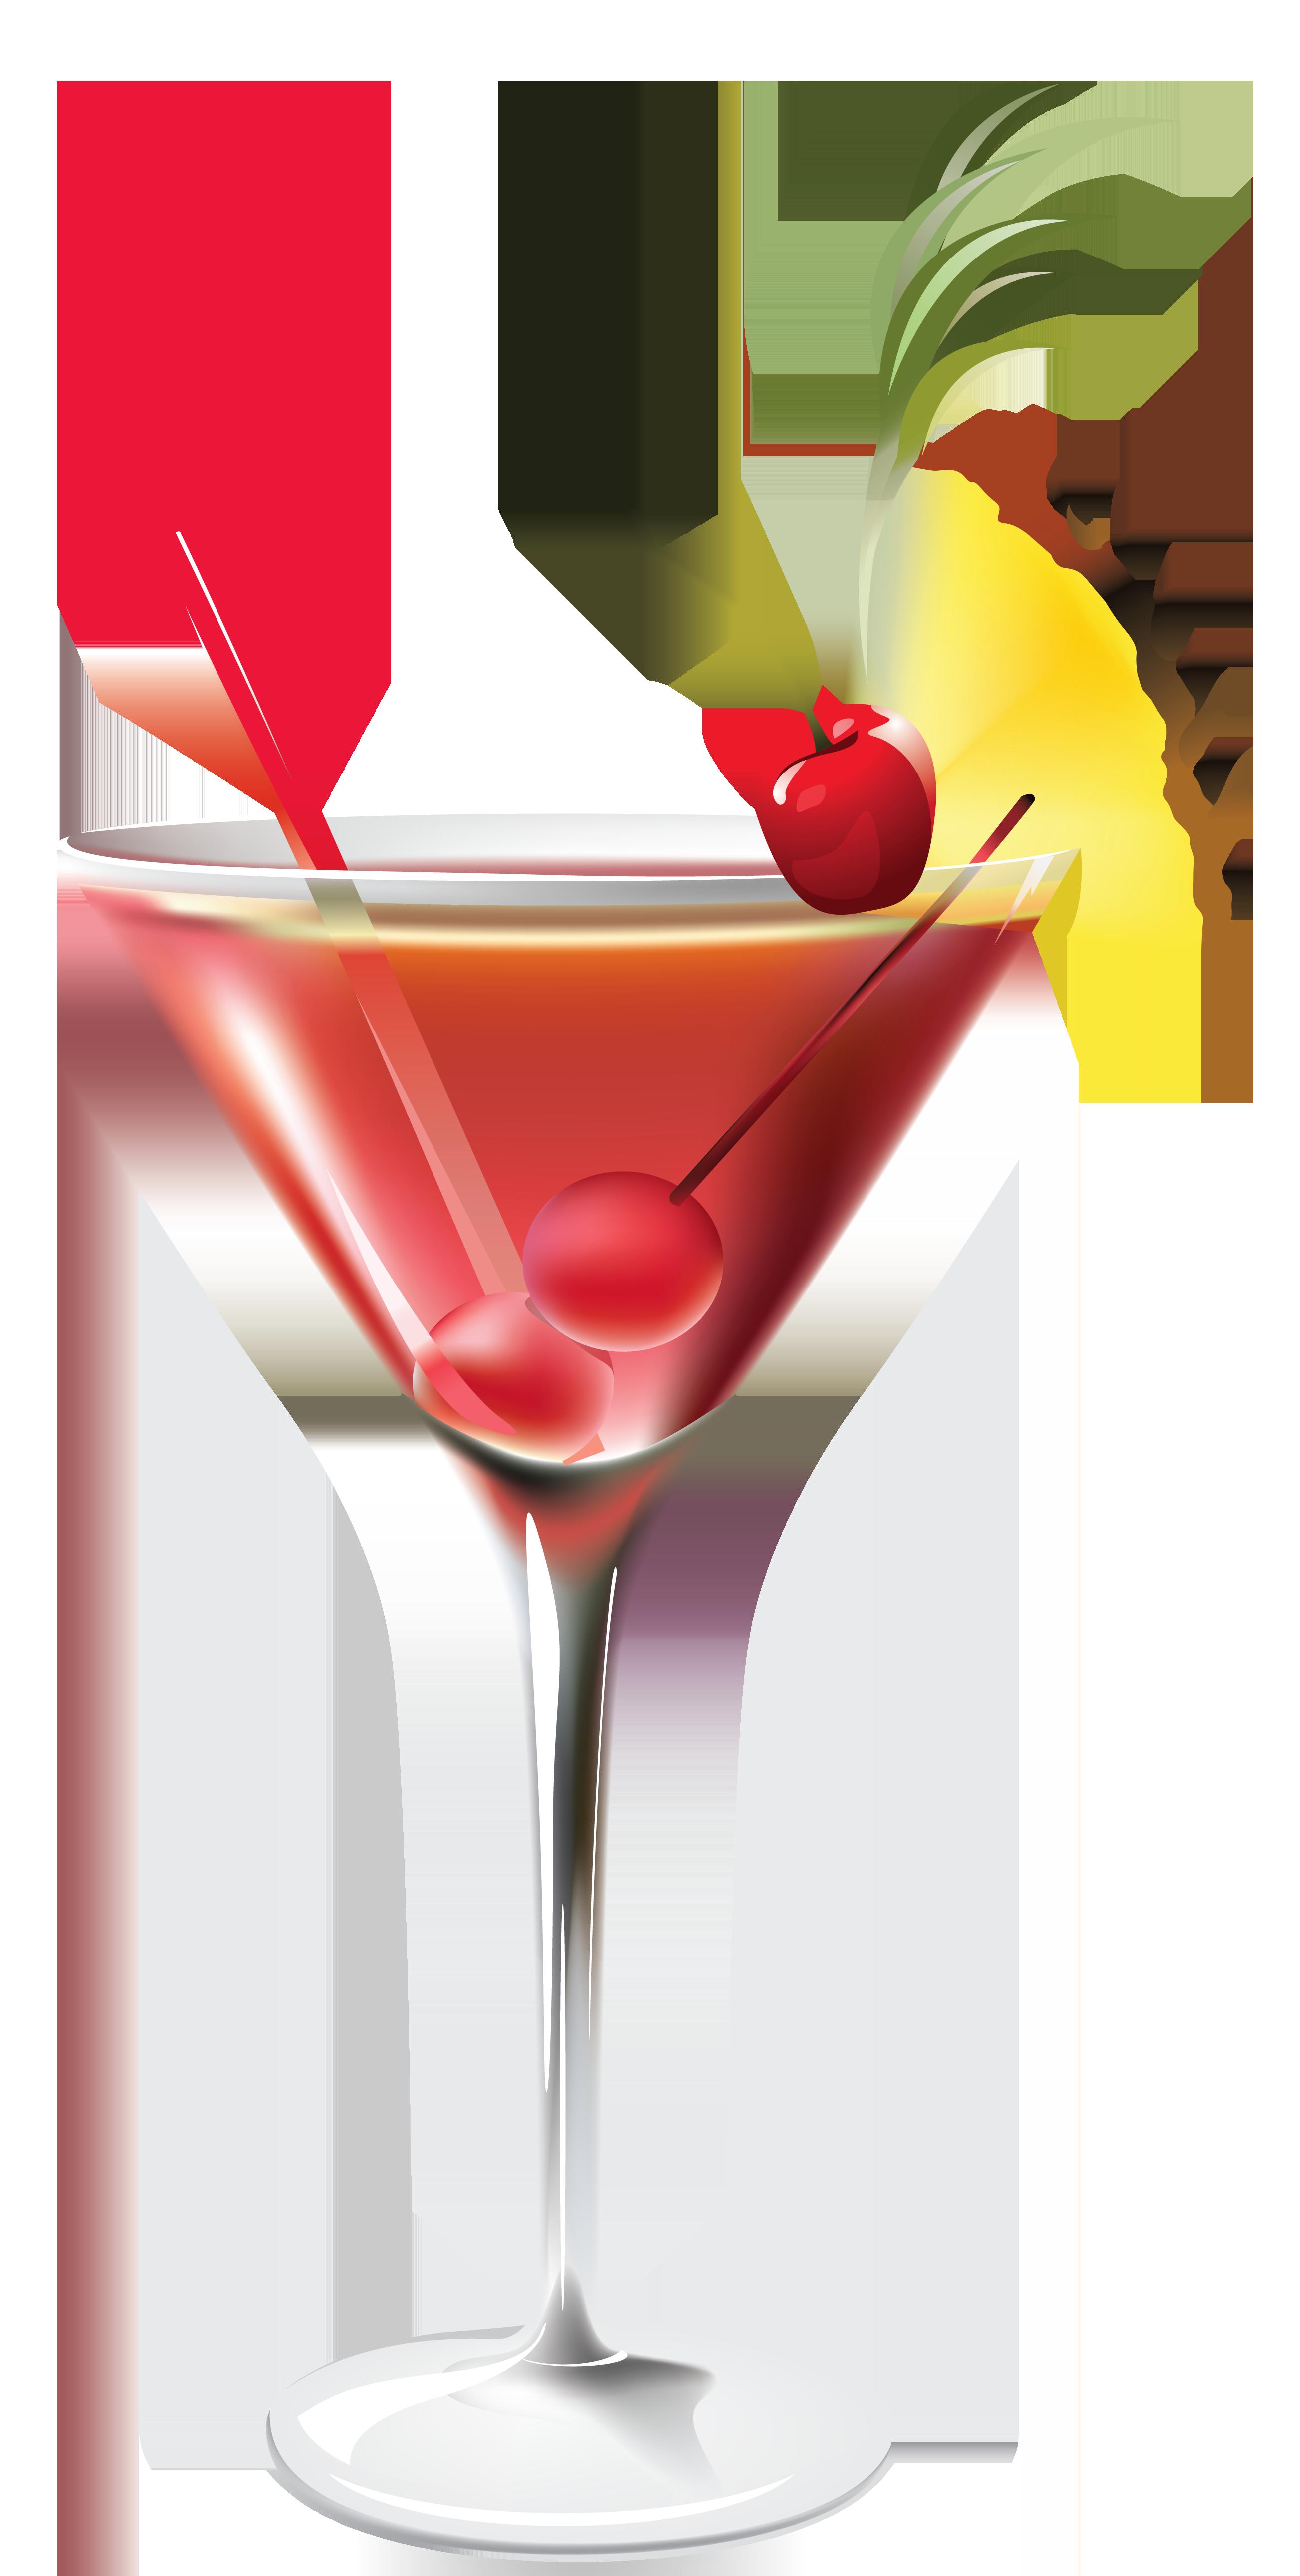 Cocktail PNG Transparent Image - Cocktail PNG